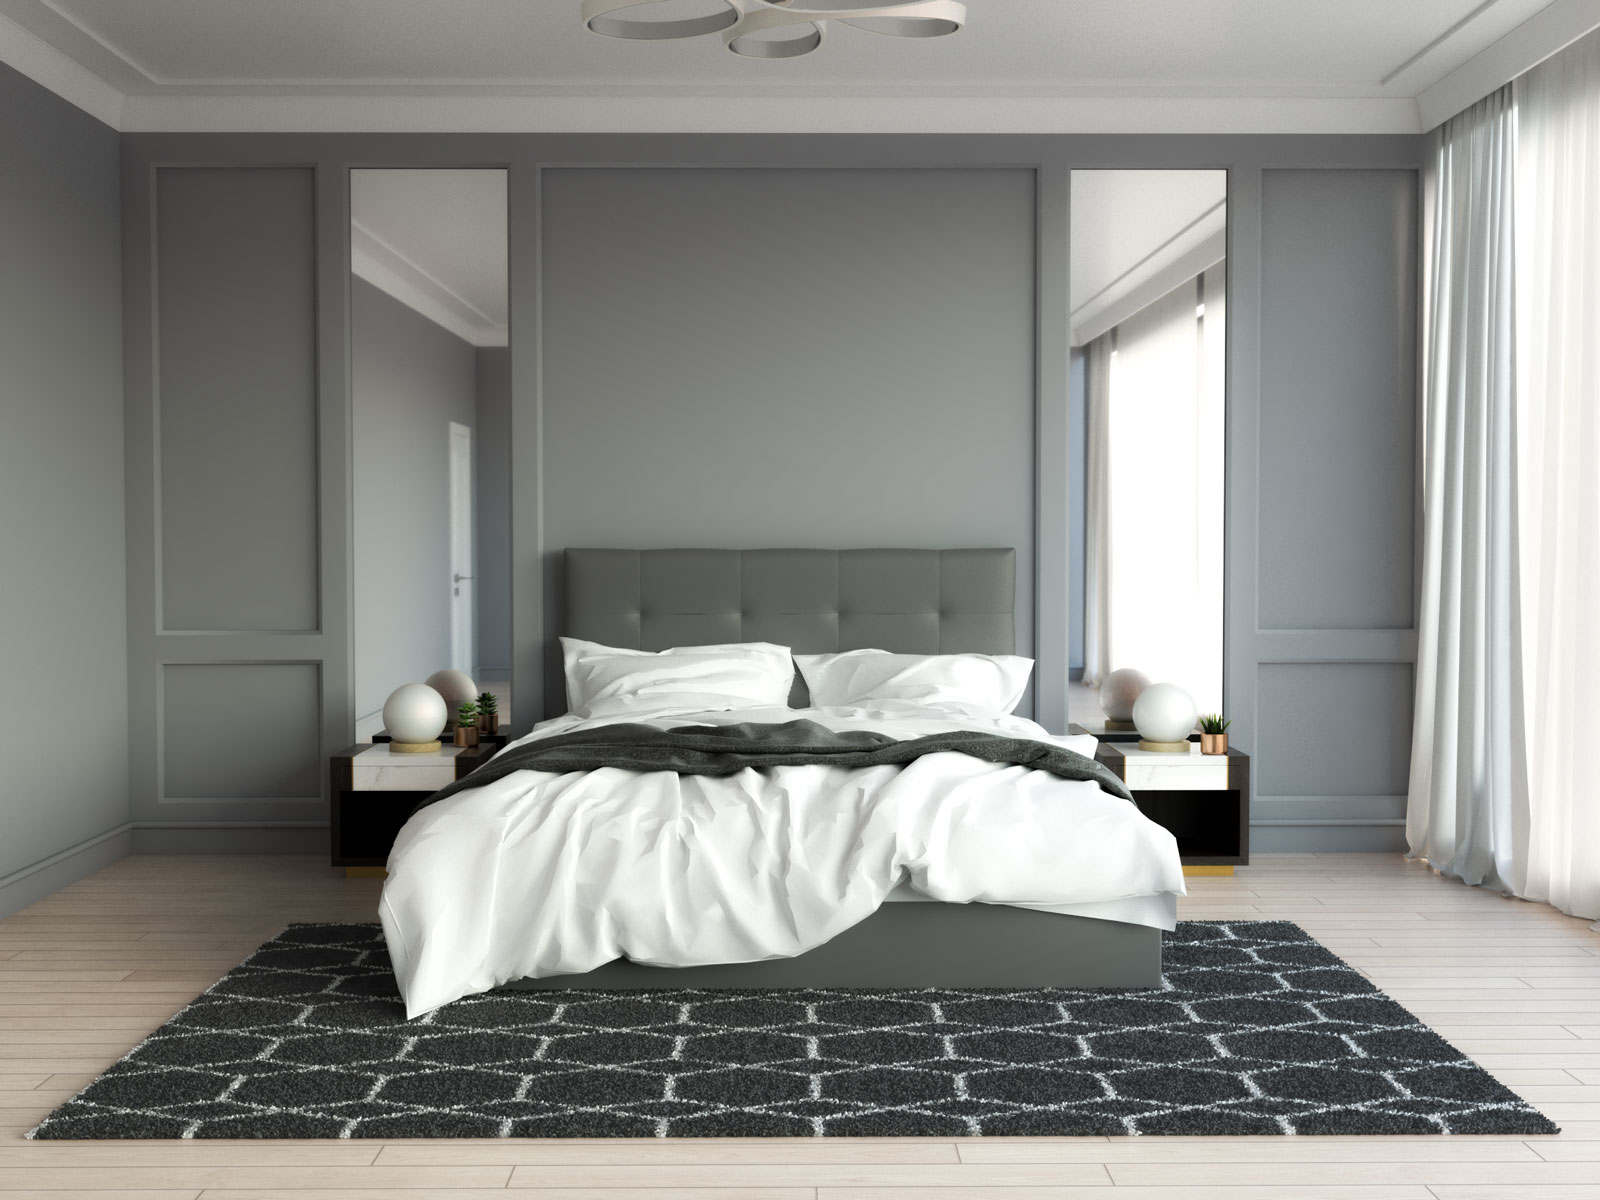 Stylish dark gray geometric rug